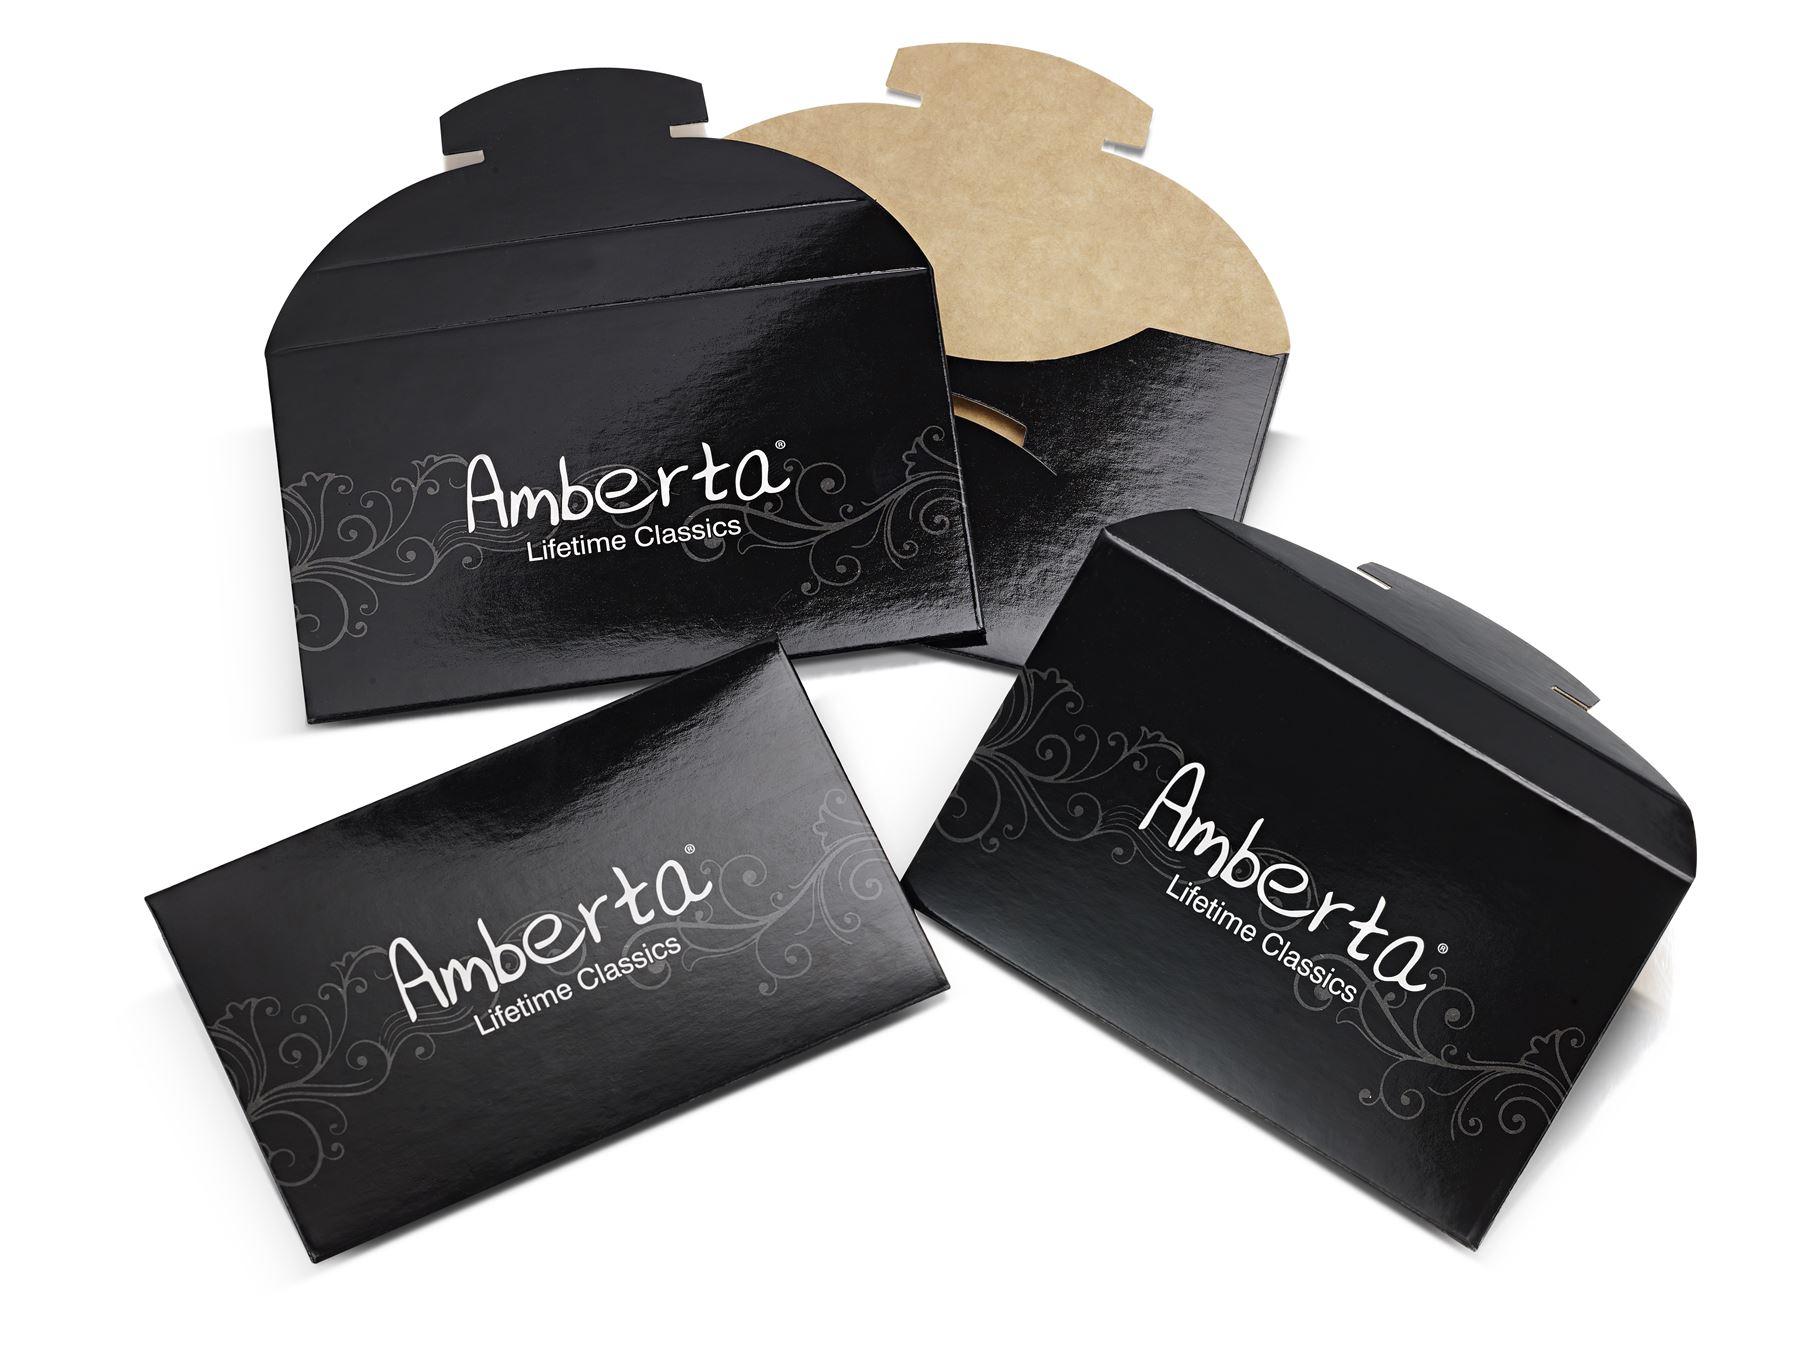 Amberta-Jewelry-925-Sterling-Silver-Adjustable-Bracelet-Italian-Bangle-for-Women miniature 10